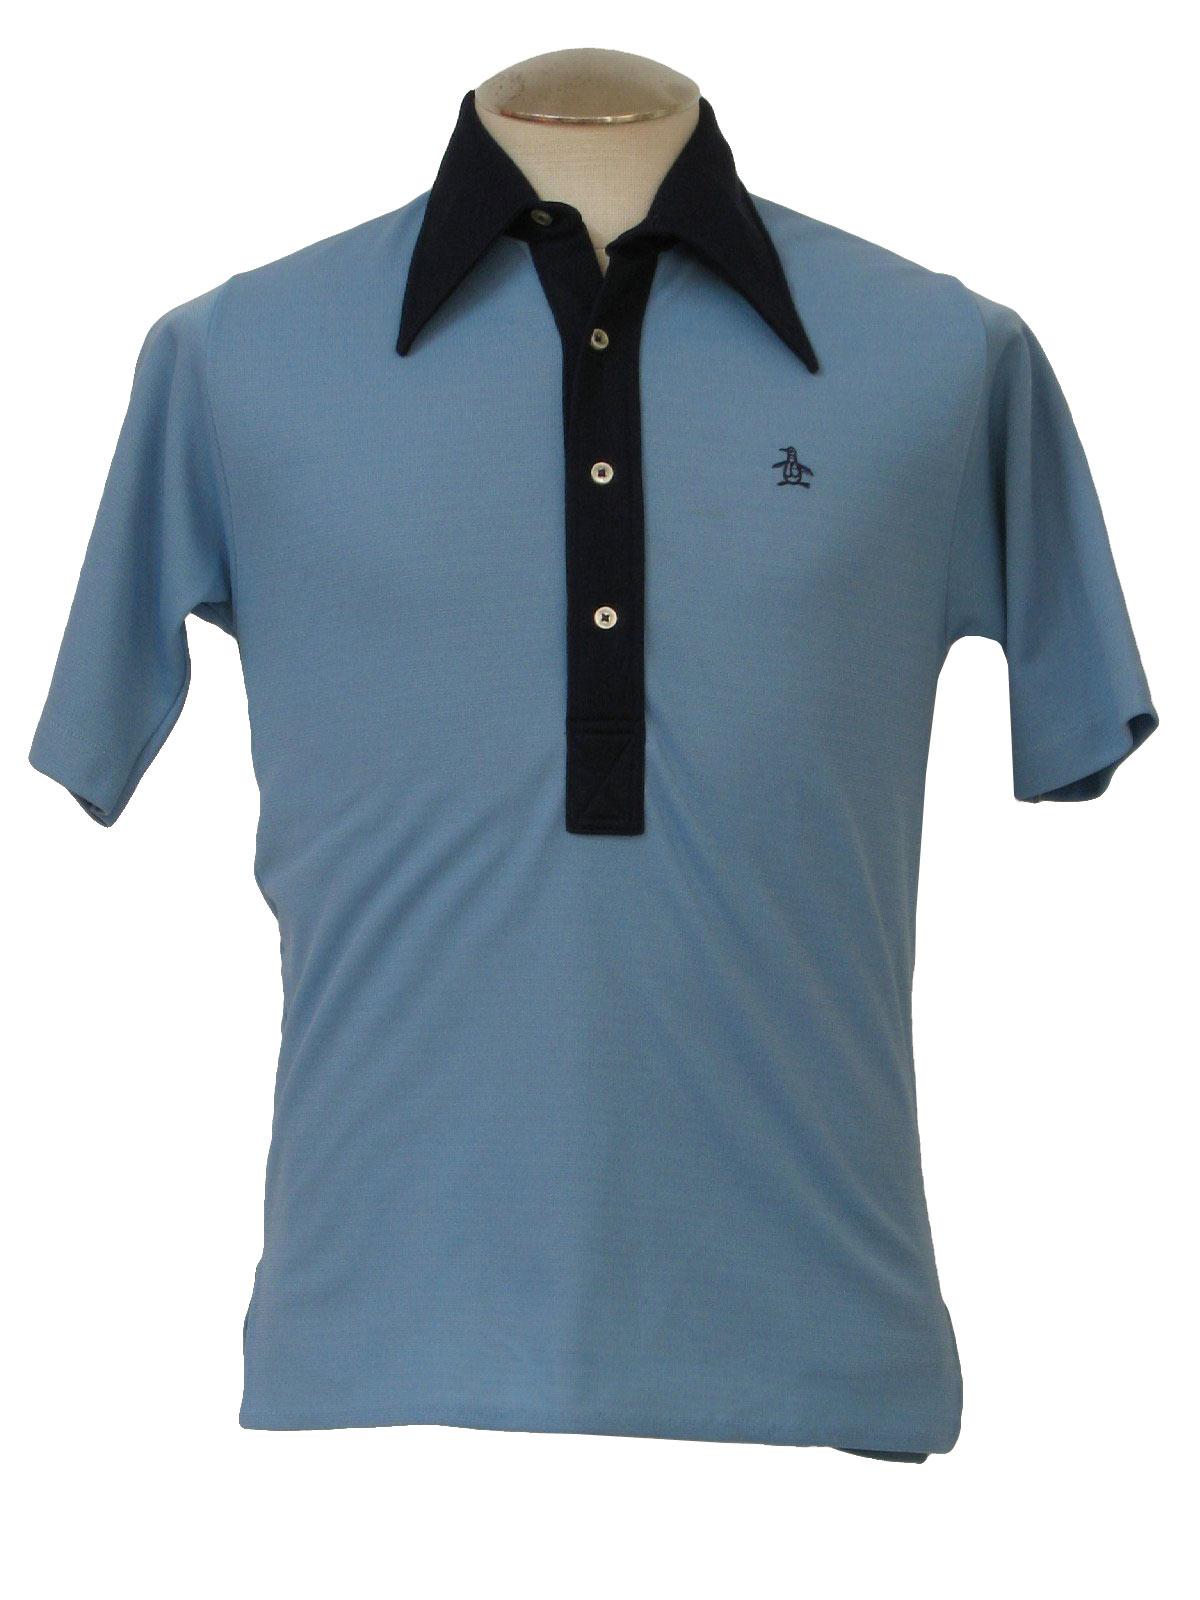 Vintage 70s shirt 70s grand slam mens sky blue and navy for Golf shirt with penguin logo